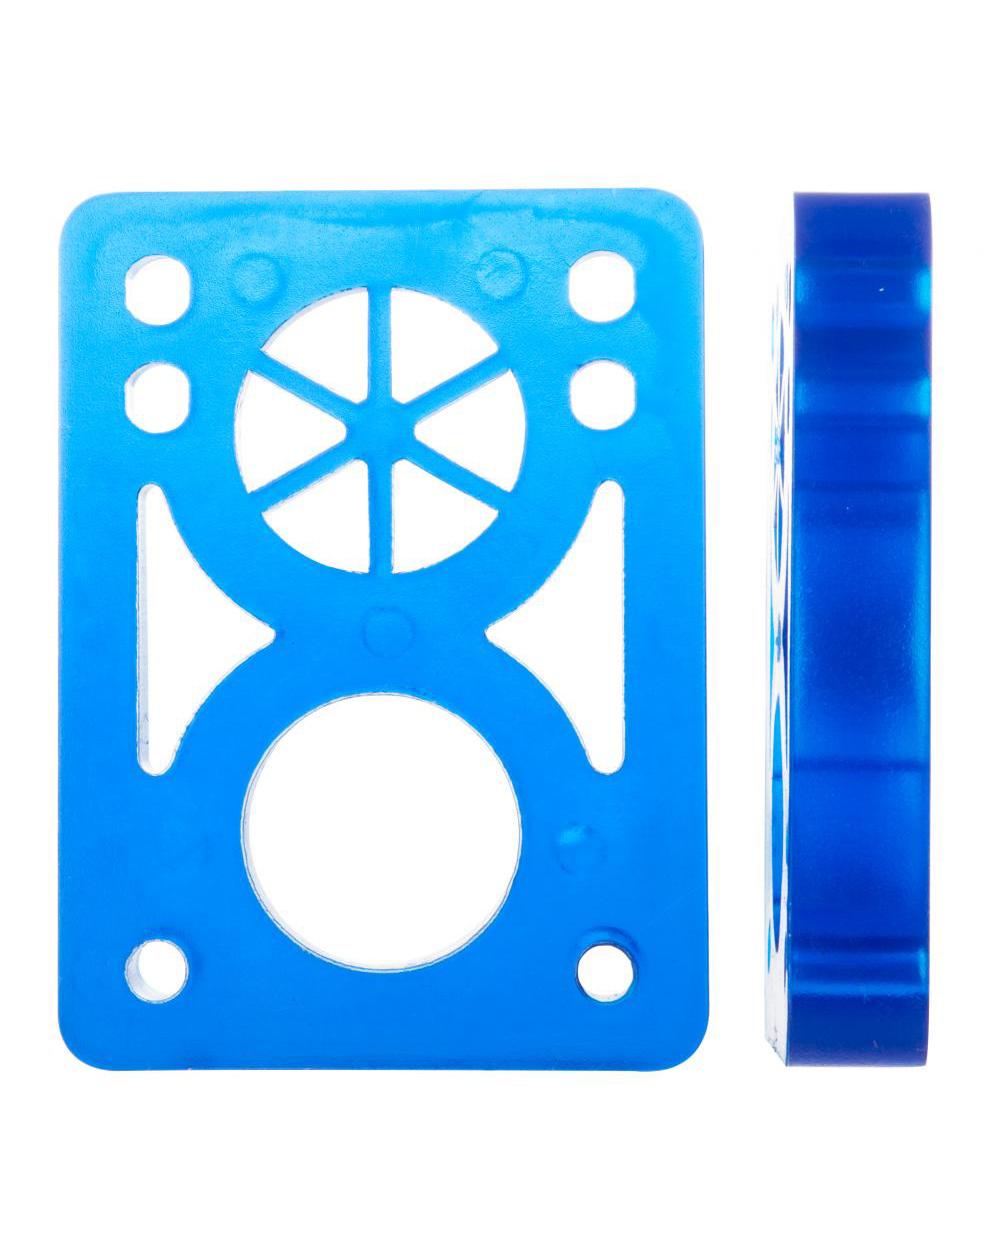 D-Street Riser Soft 1/2-inch Clear Blue 2 pz